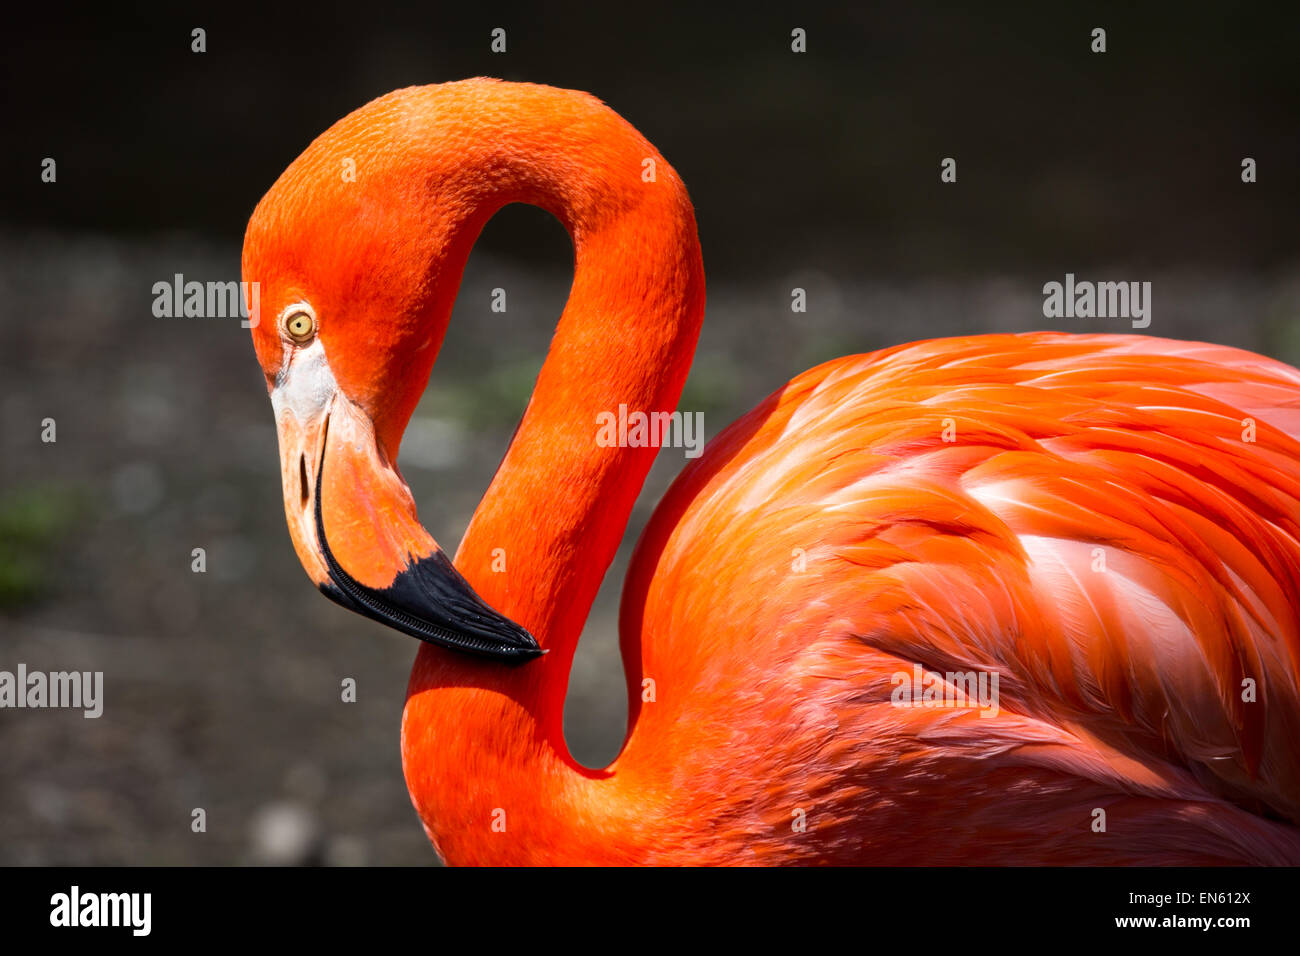 Amerikanische Flamingo Stockbild